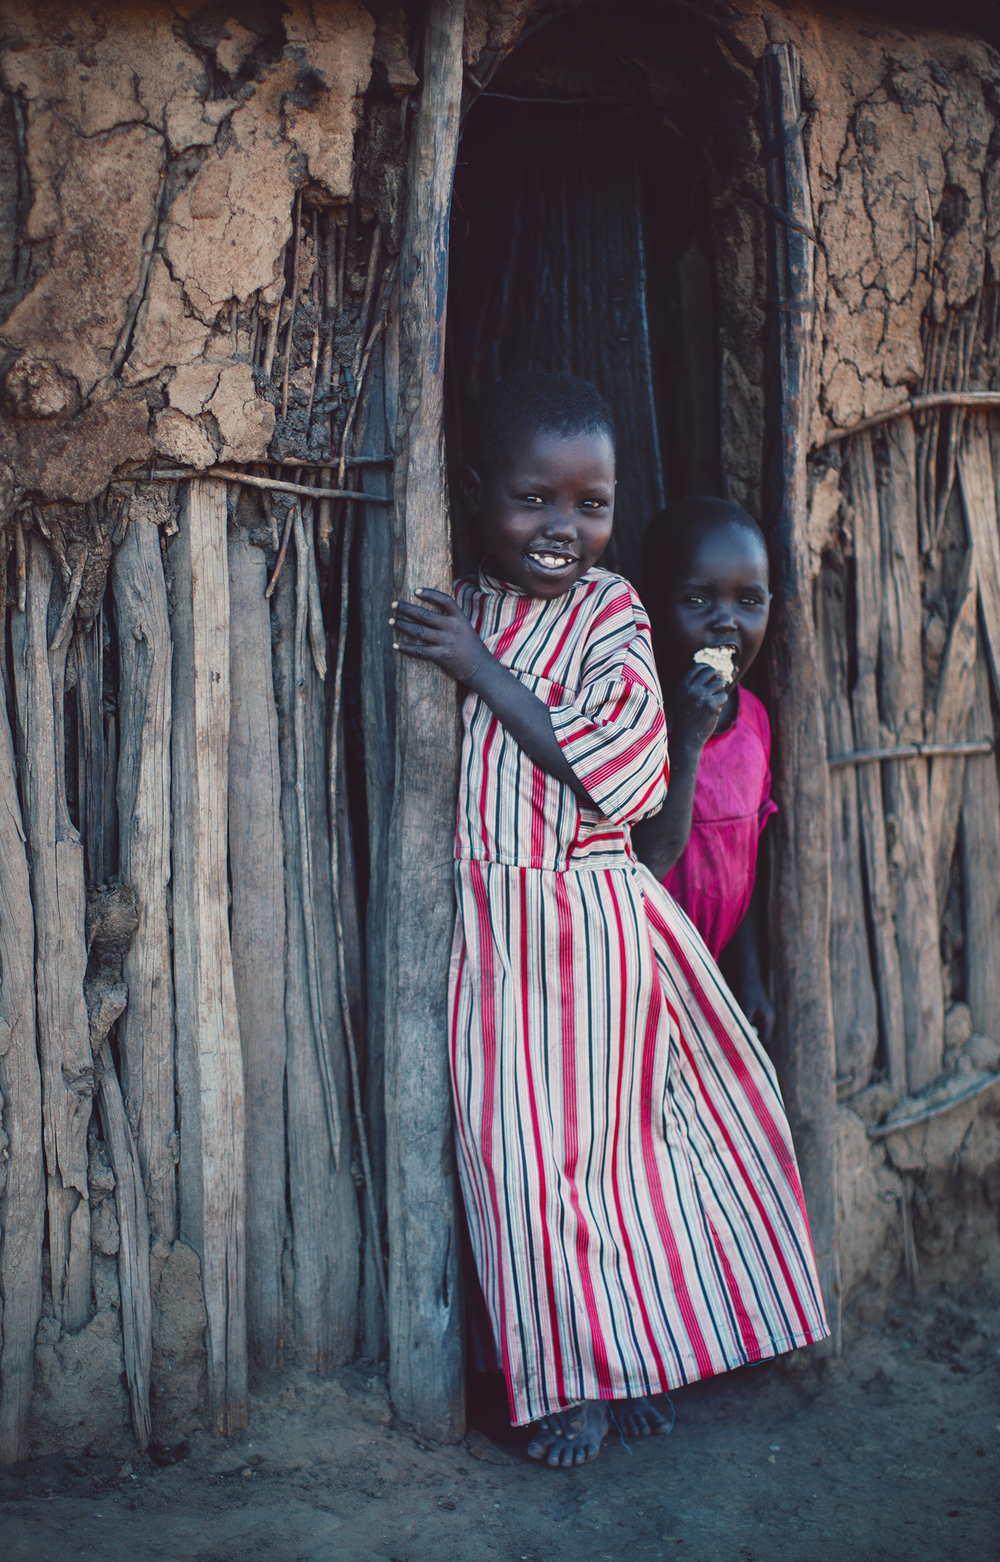 African Children culture portraiture